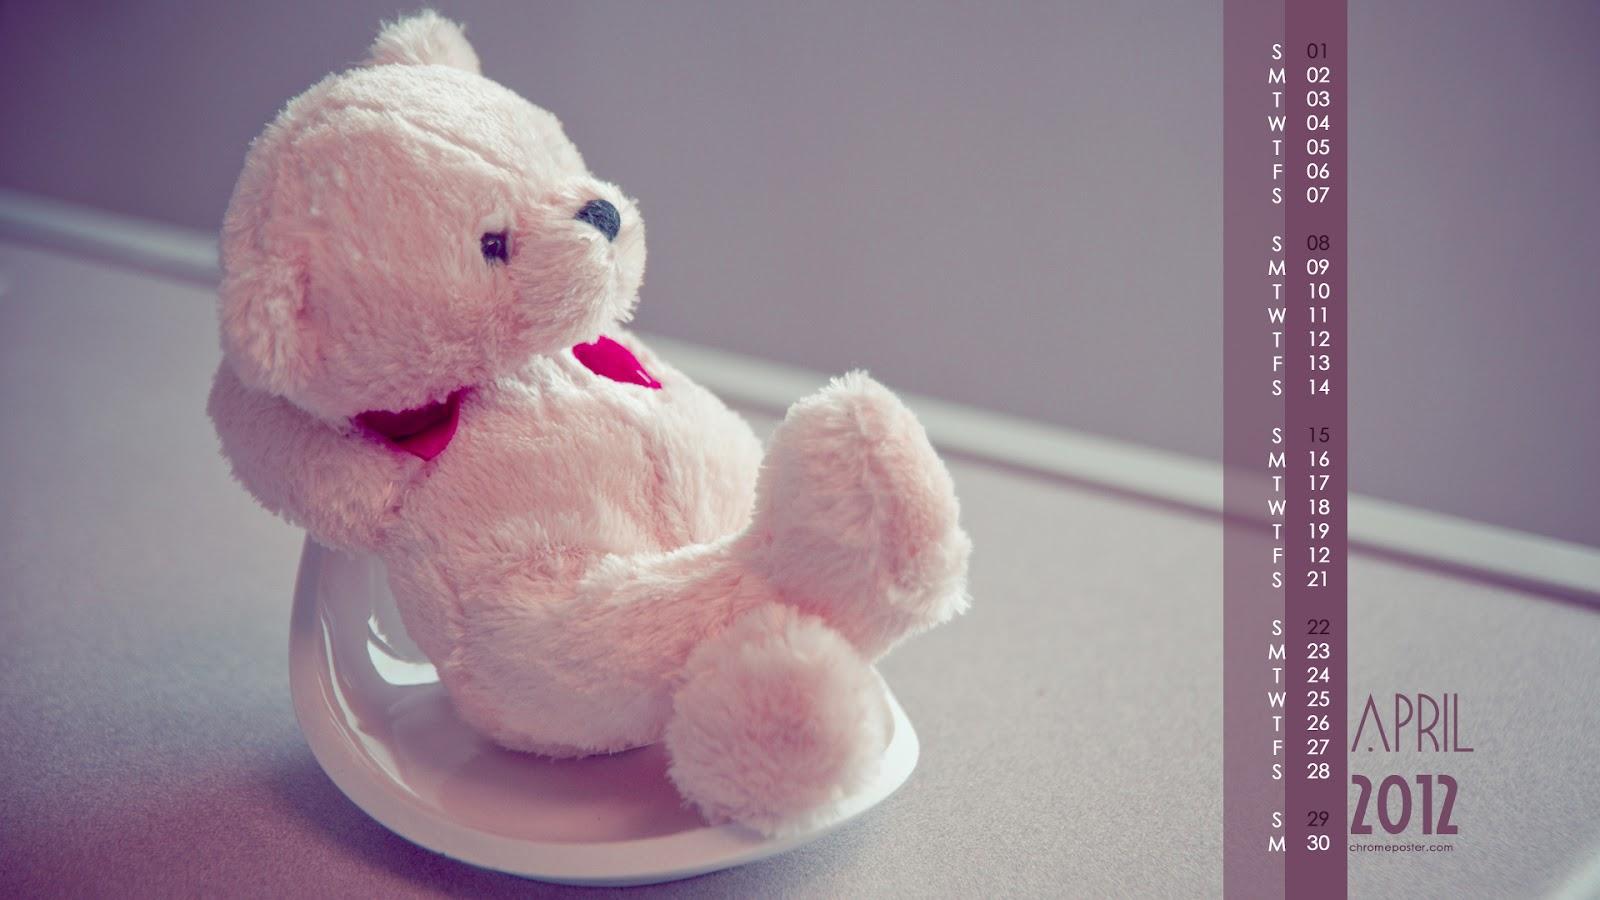 https://2.bp.blogspot.com/-jAUYGclbe4U/T3SLoxEz5EI/AAAAAAAAGiE/uQ7Ahf5a7KI/s1600/furry_teddy-1920-x-1080.jpg